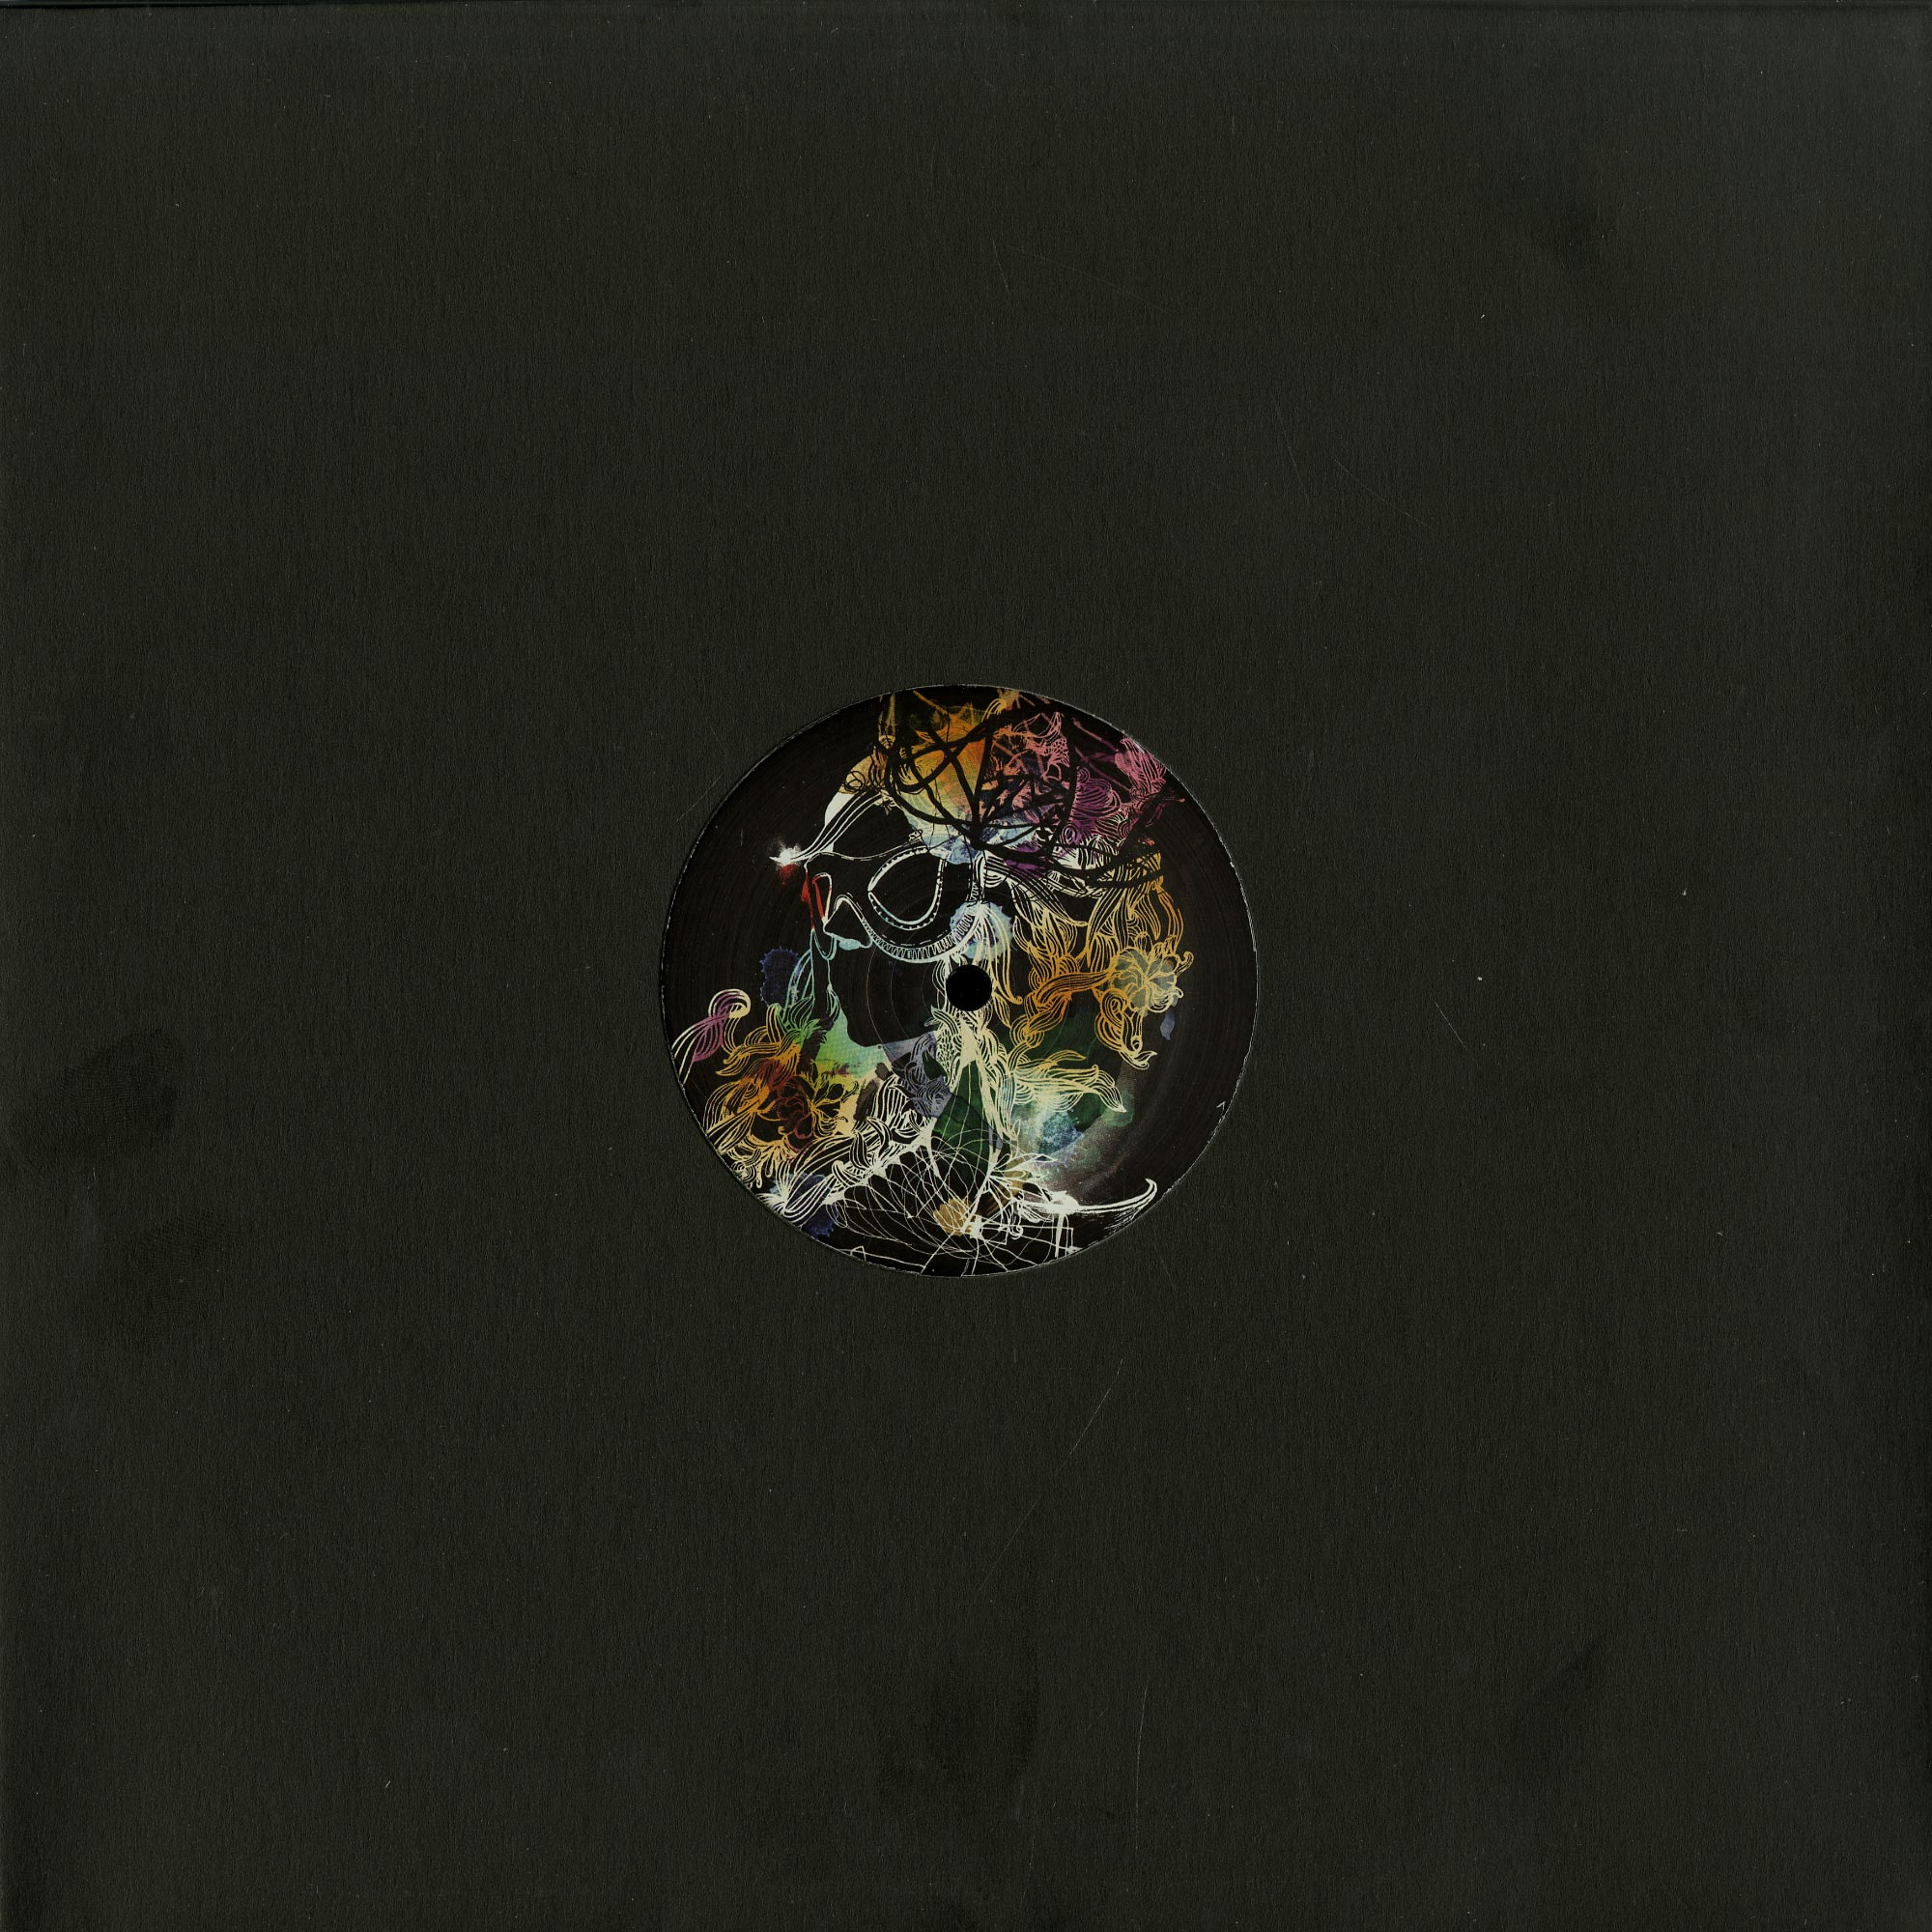 Sam Paganini - BLACK LEATHER EP PT1